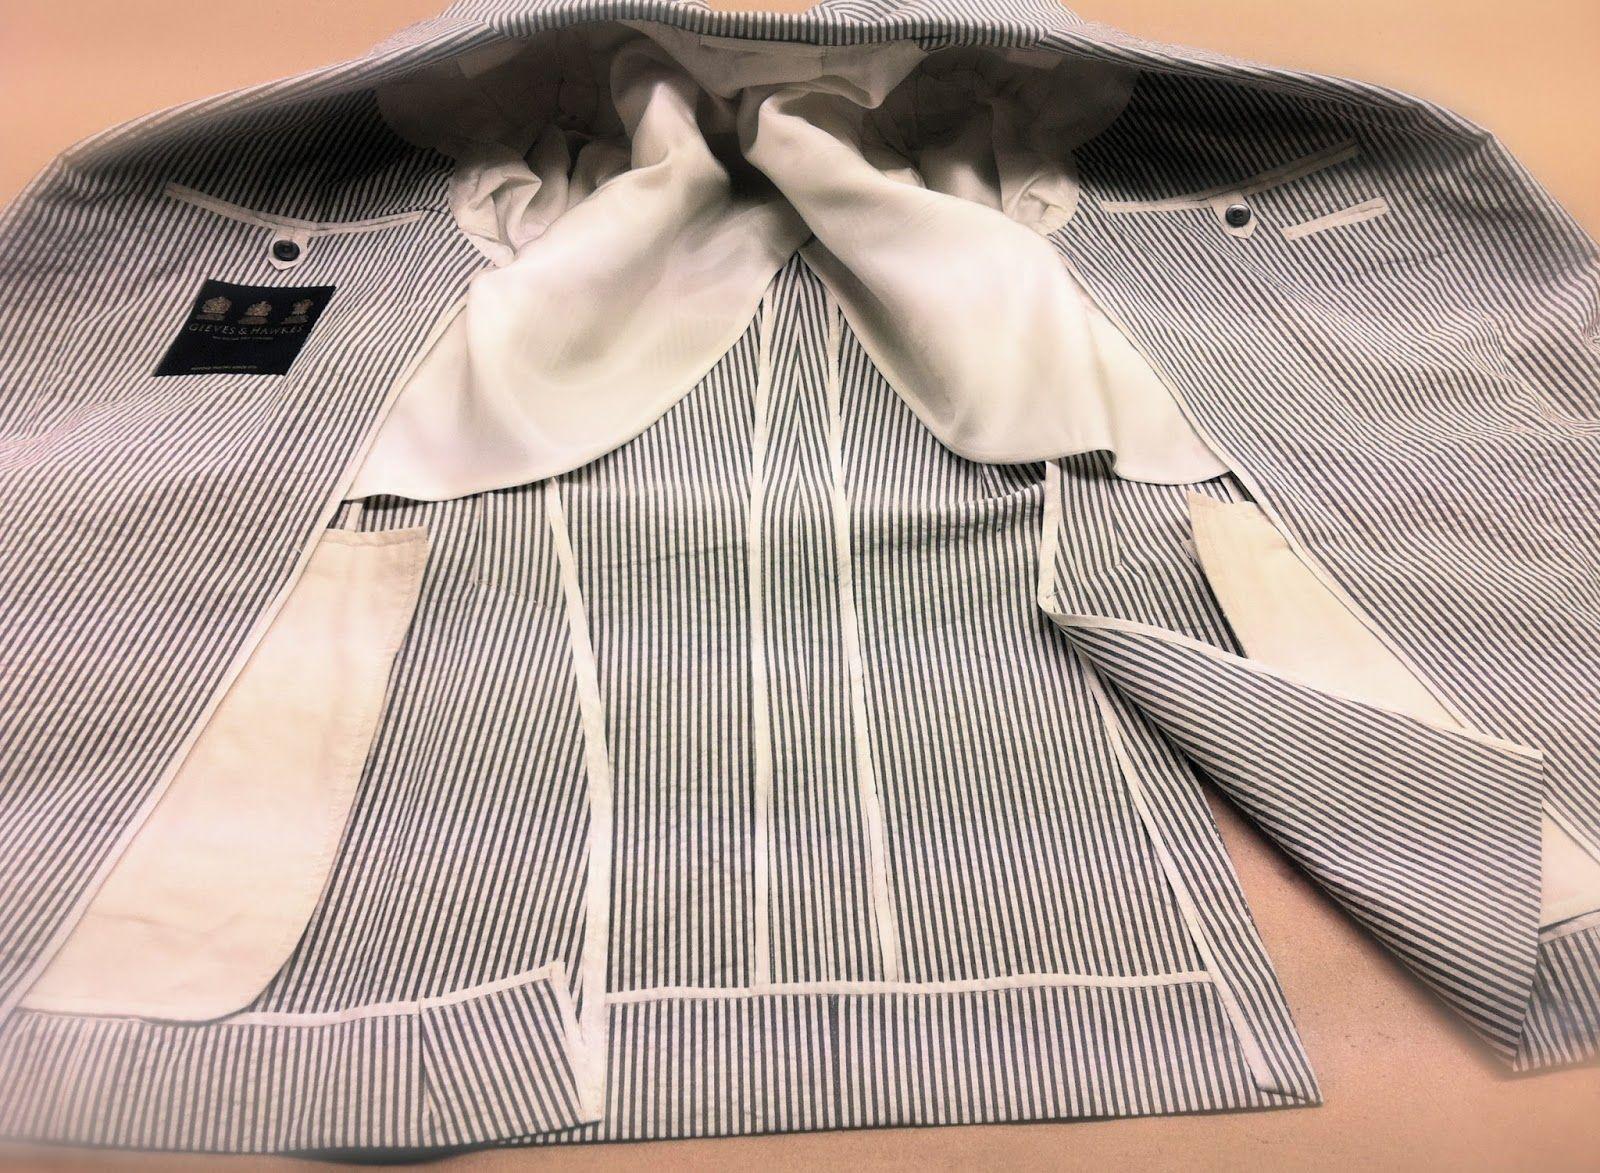 DAVIDE TAUB: G&H Bespoke: Semi-Lined, Grey/Off-White Bengal Str...